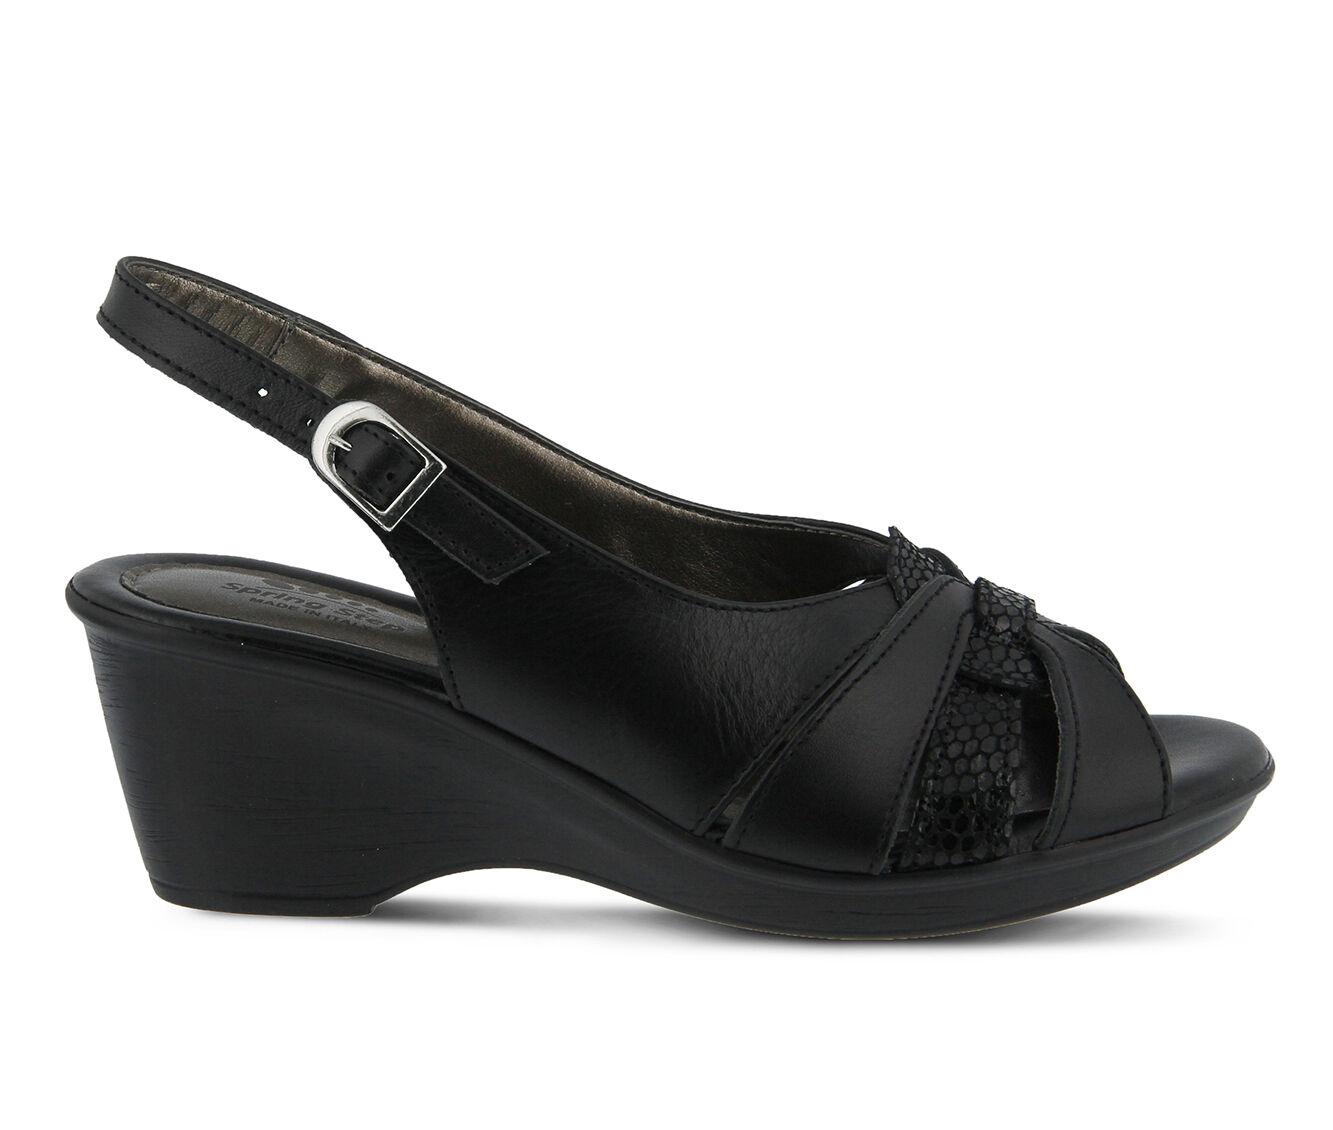 Wholesale Women's SPRING STEP Adorable Dress Sandals Black